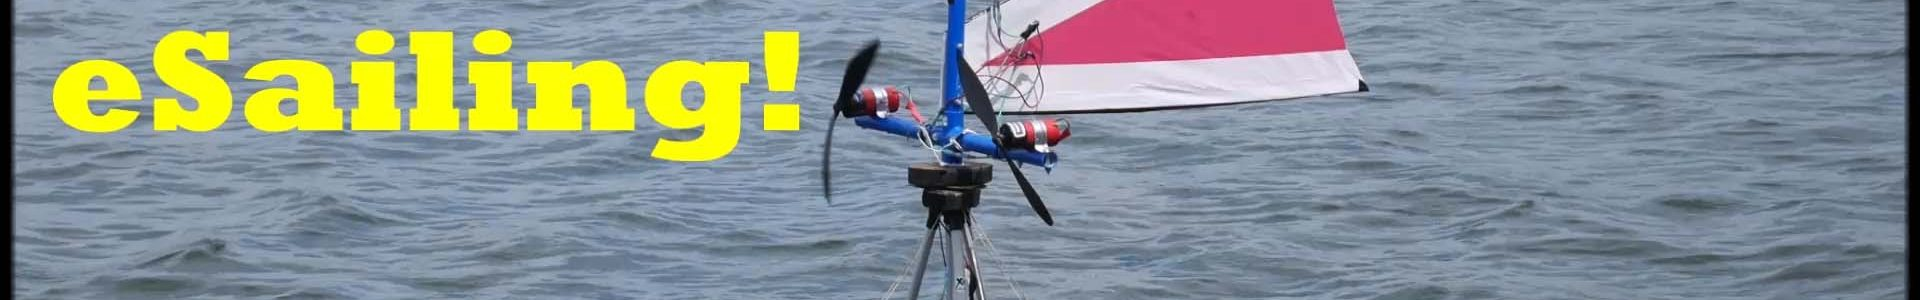 On Board The eSailing Wind Turbine Boat